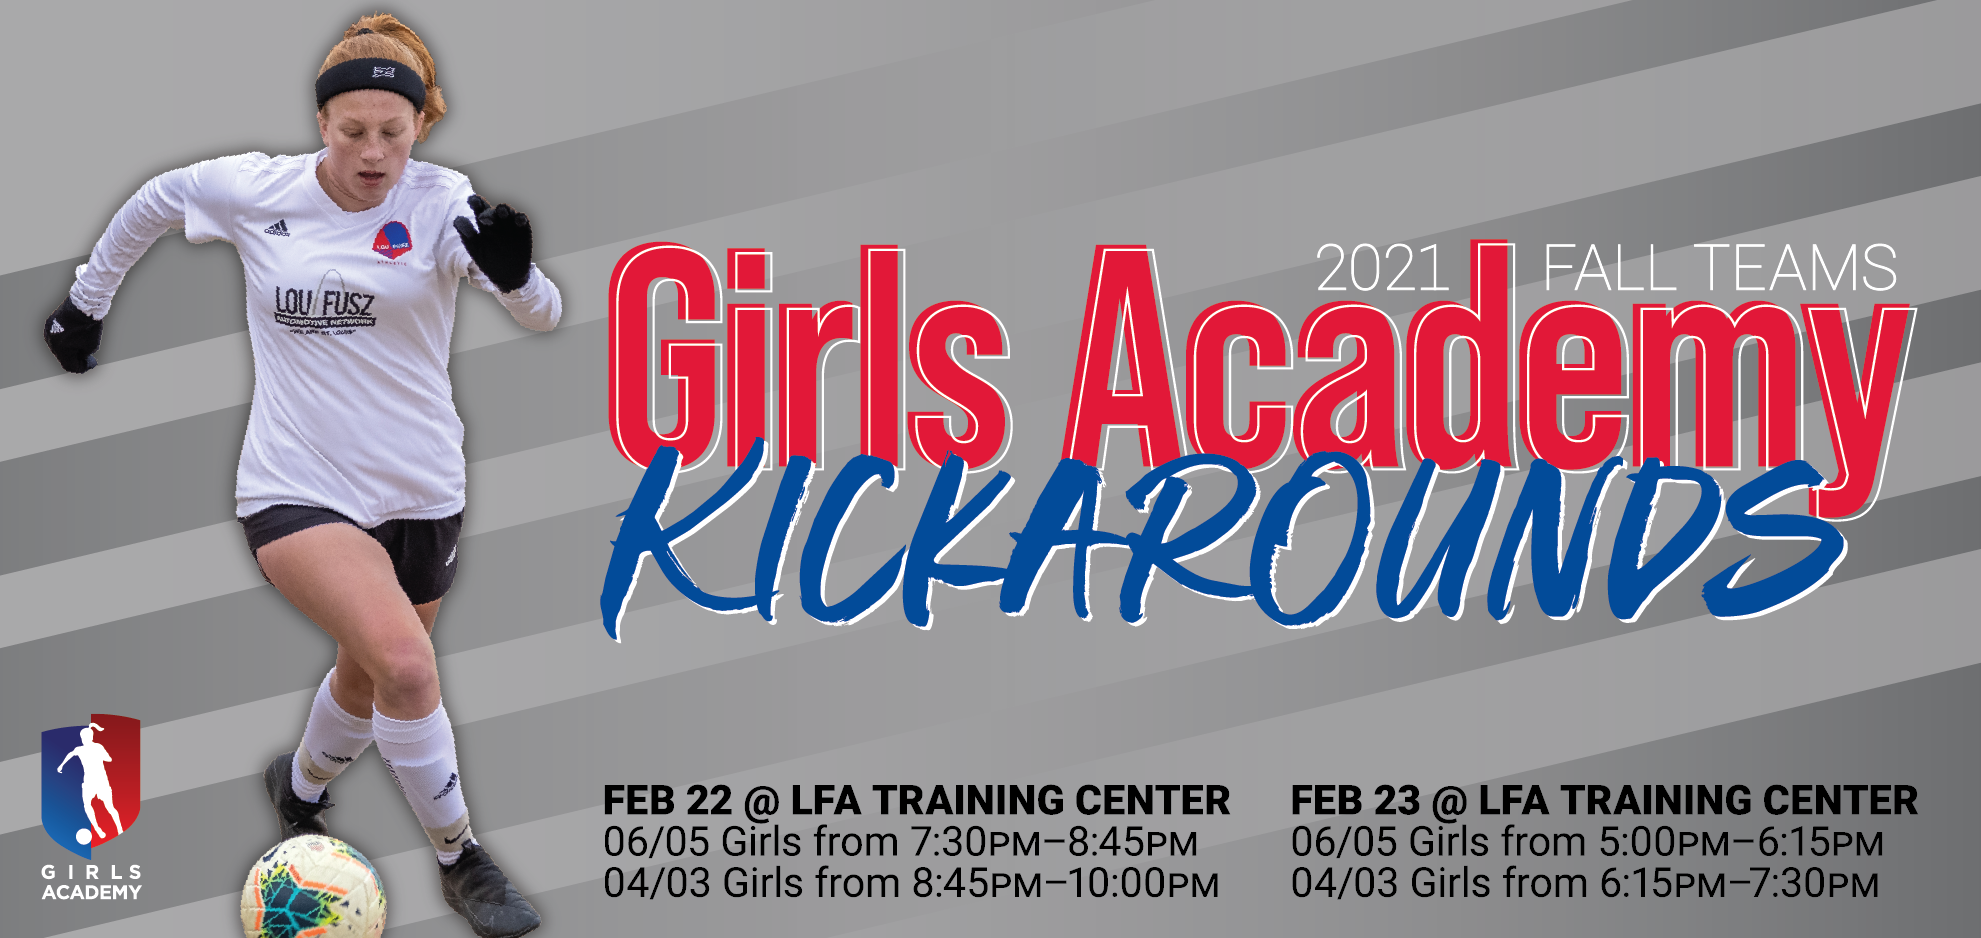 2021 Girls Academy Kickarounds logo